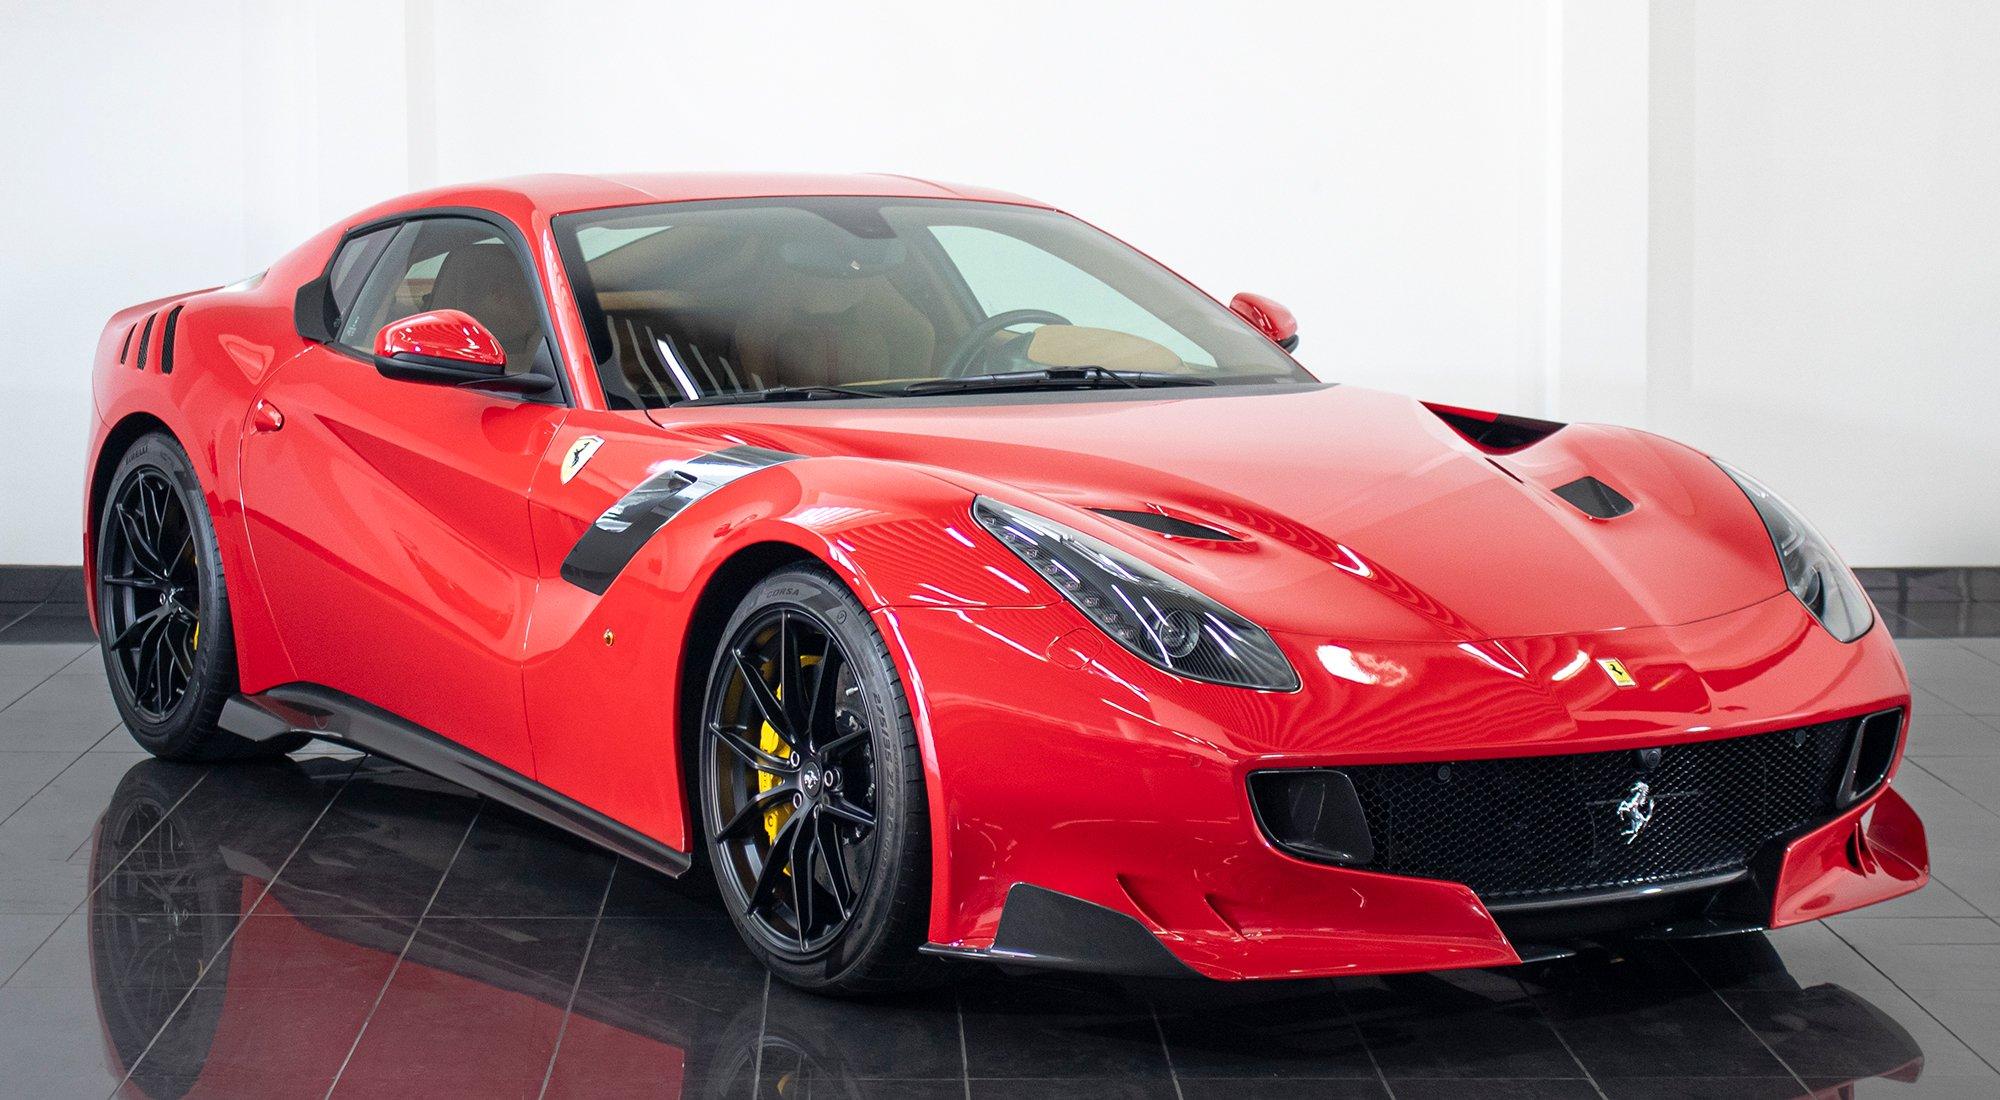 2016 Ferrari F12 Tdf In Dubai United Arab Emirates For Sale 11135449